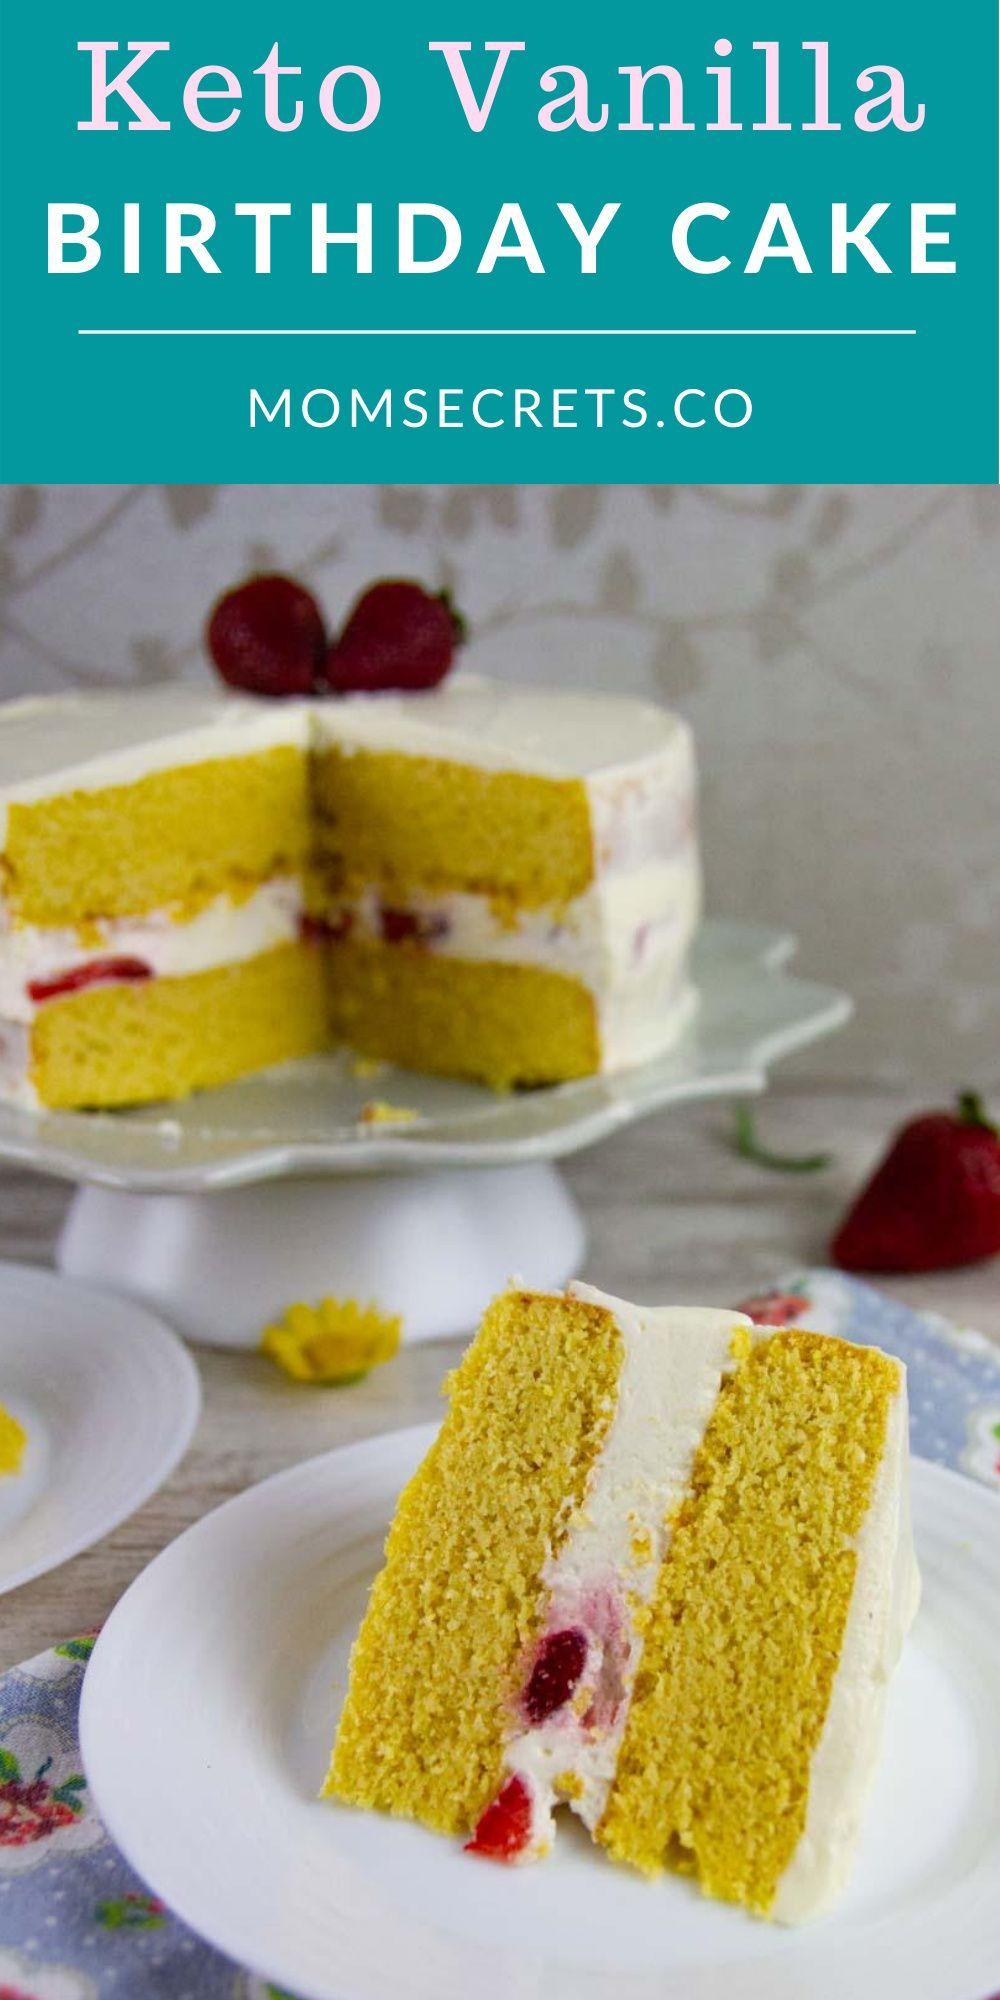 Keto Vanilla Birthday Cake GlutenFree Low Carb in 2020